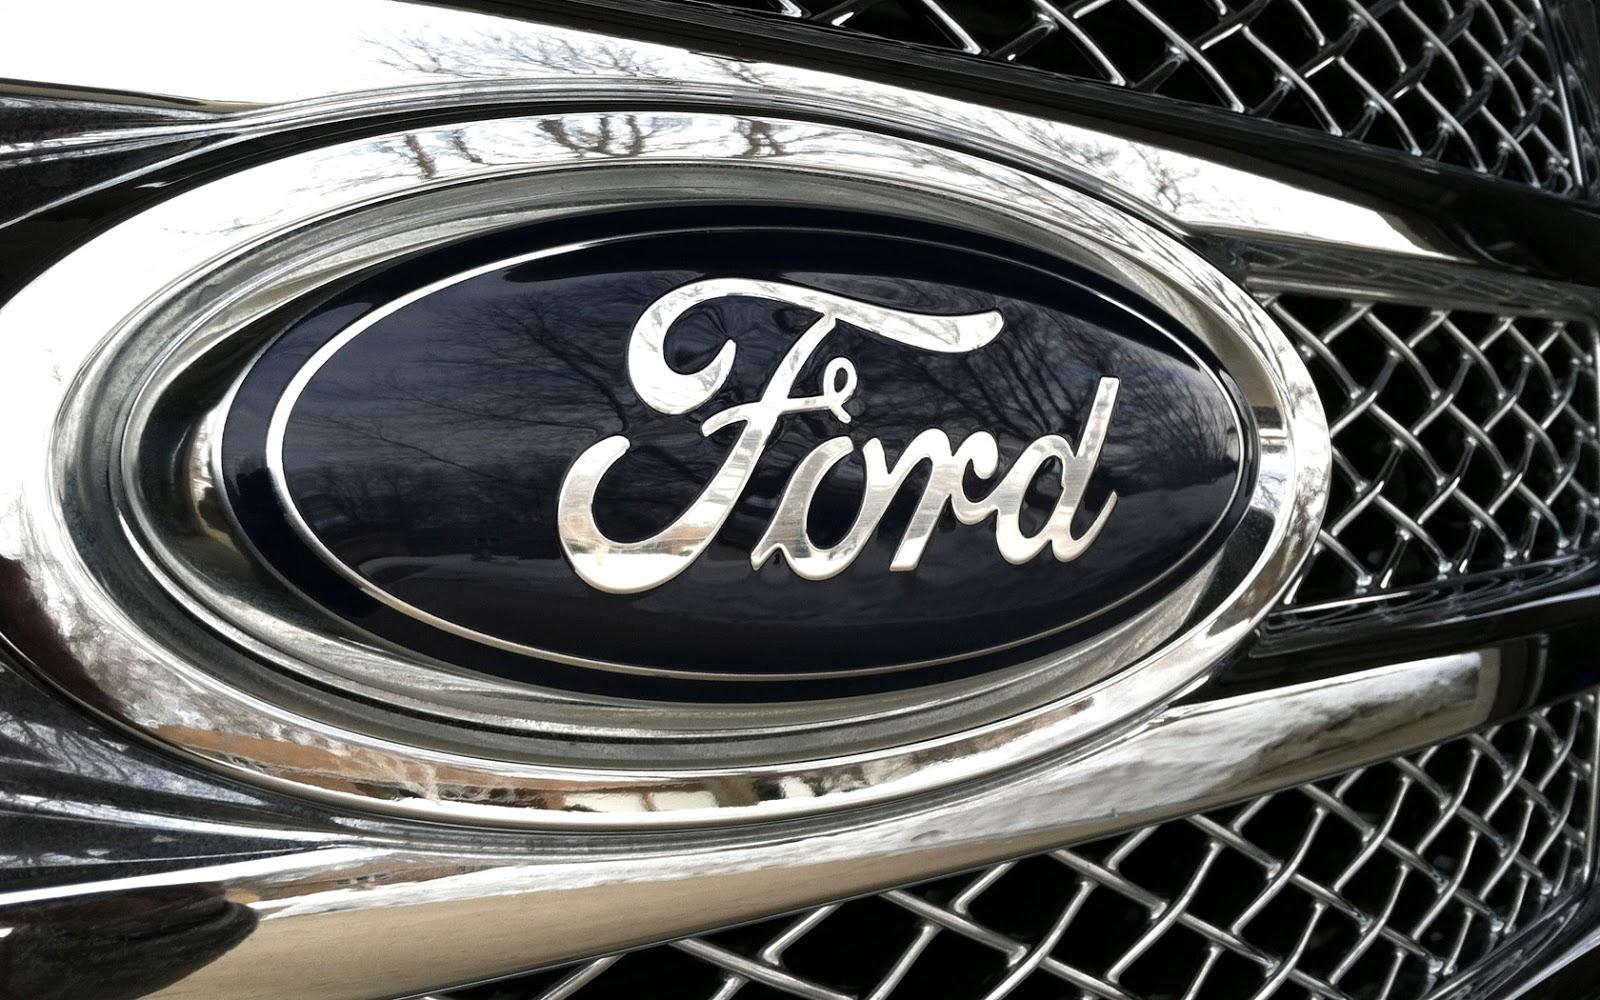 Free Ford Logo Onan 4000 Generator Parts Diagram Car Logos